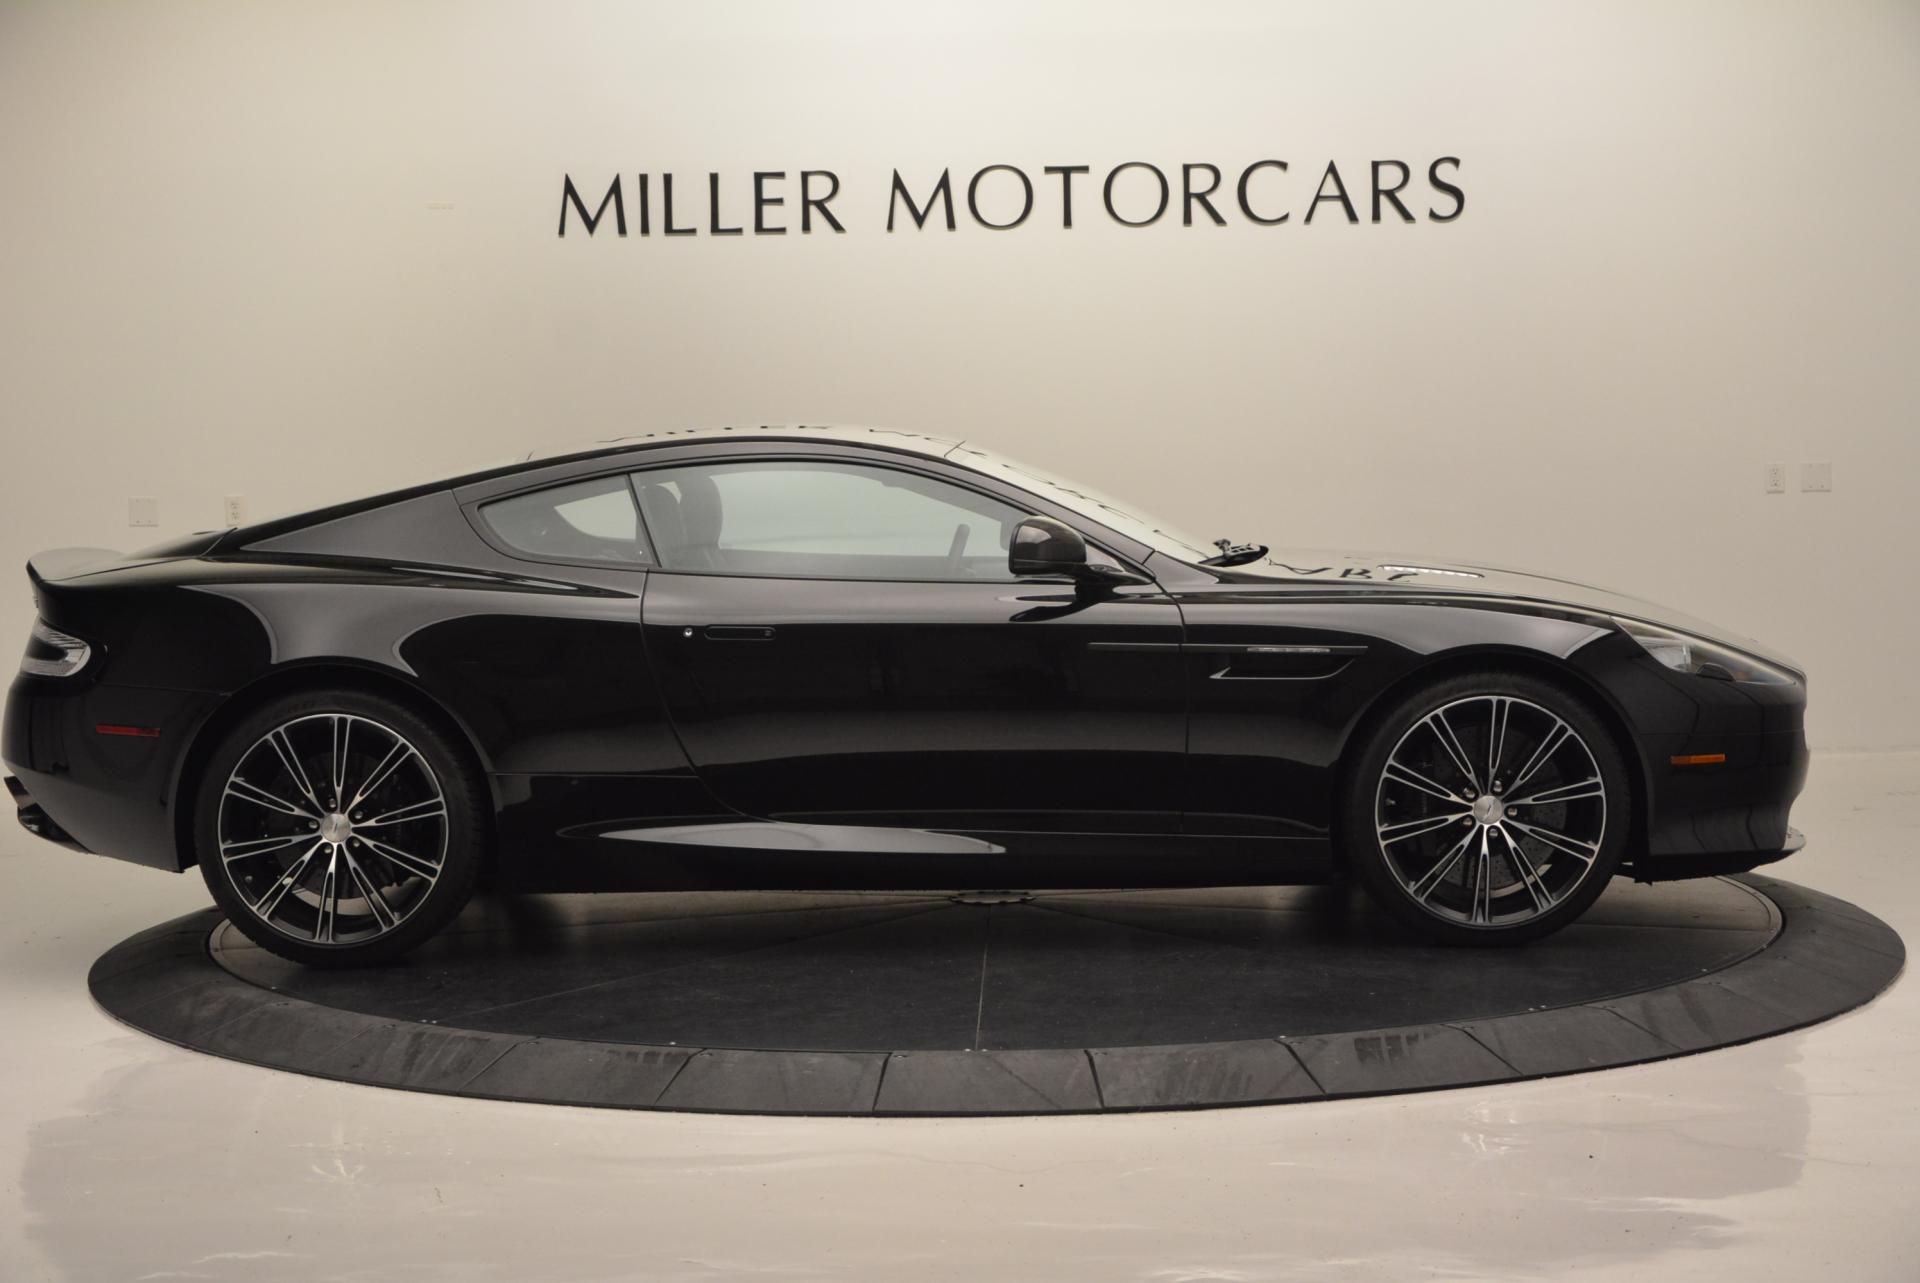 Used 2015 Aston Martin DB9 Carbon Edition For Sale In Greenwich, CT. Alfa Romeo of Greenwich, 7349 528_p9